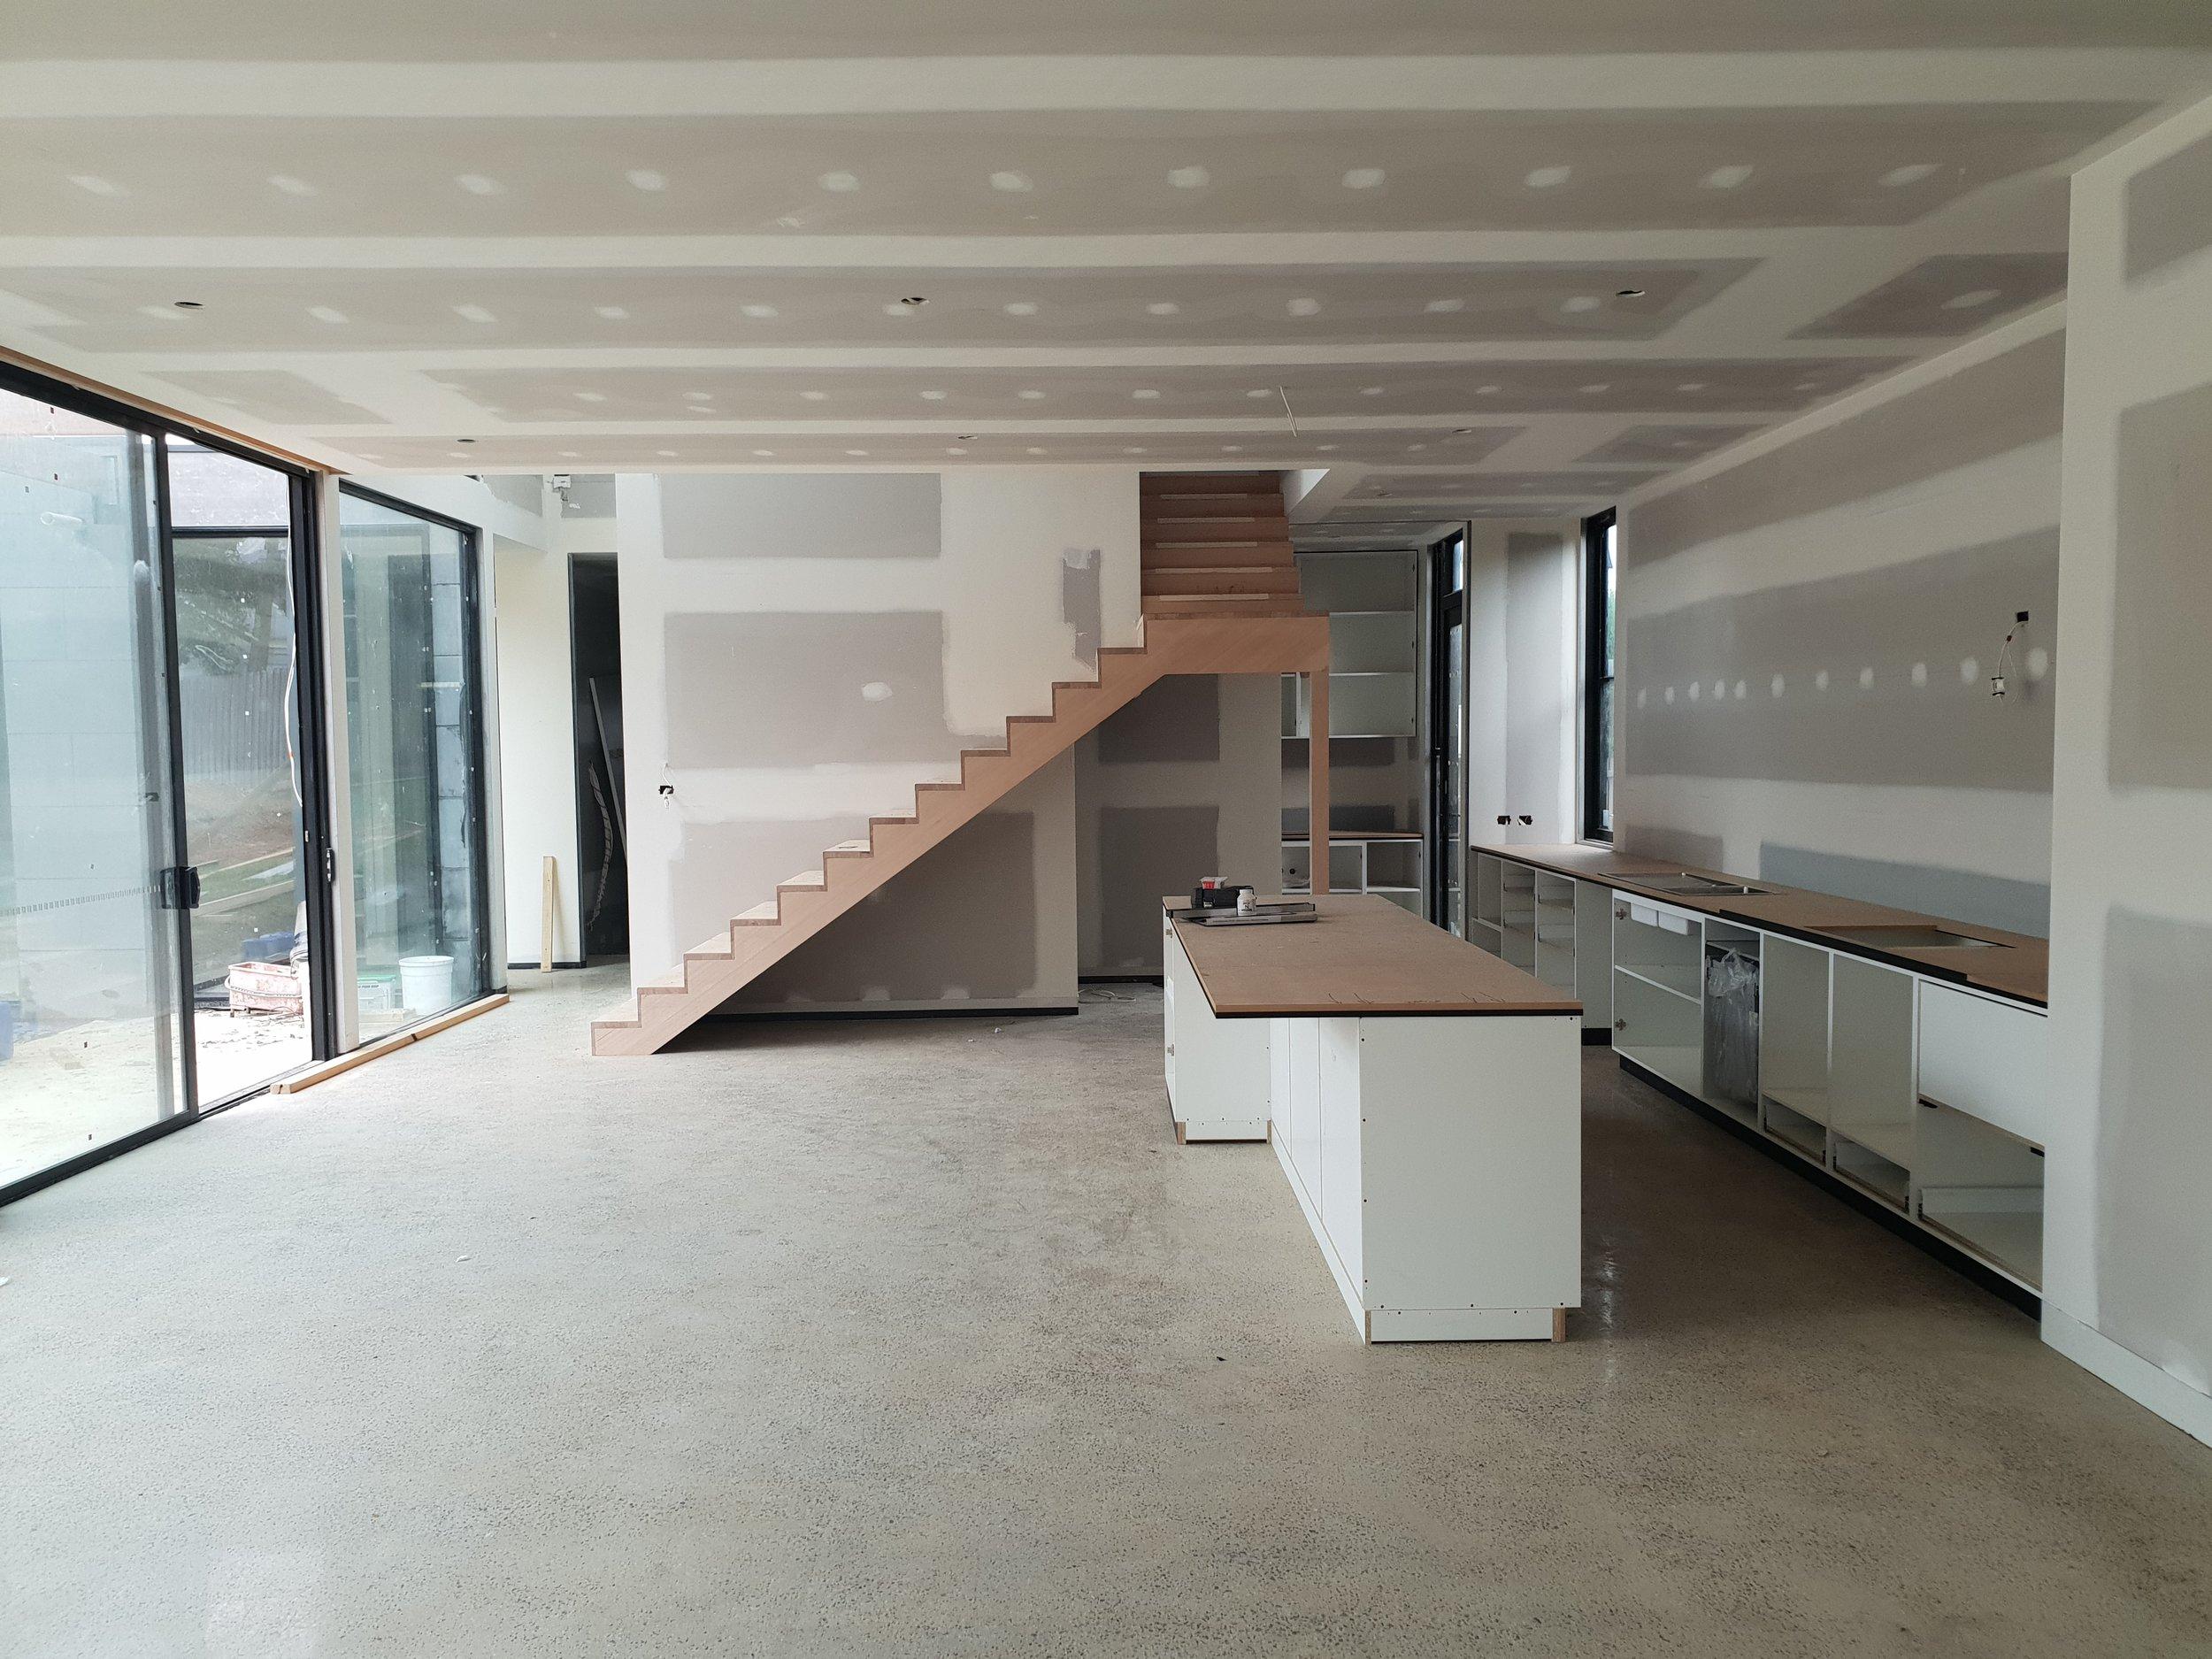 lifespaces bluestone house kitchen stairs 2.jpg